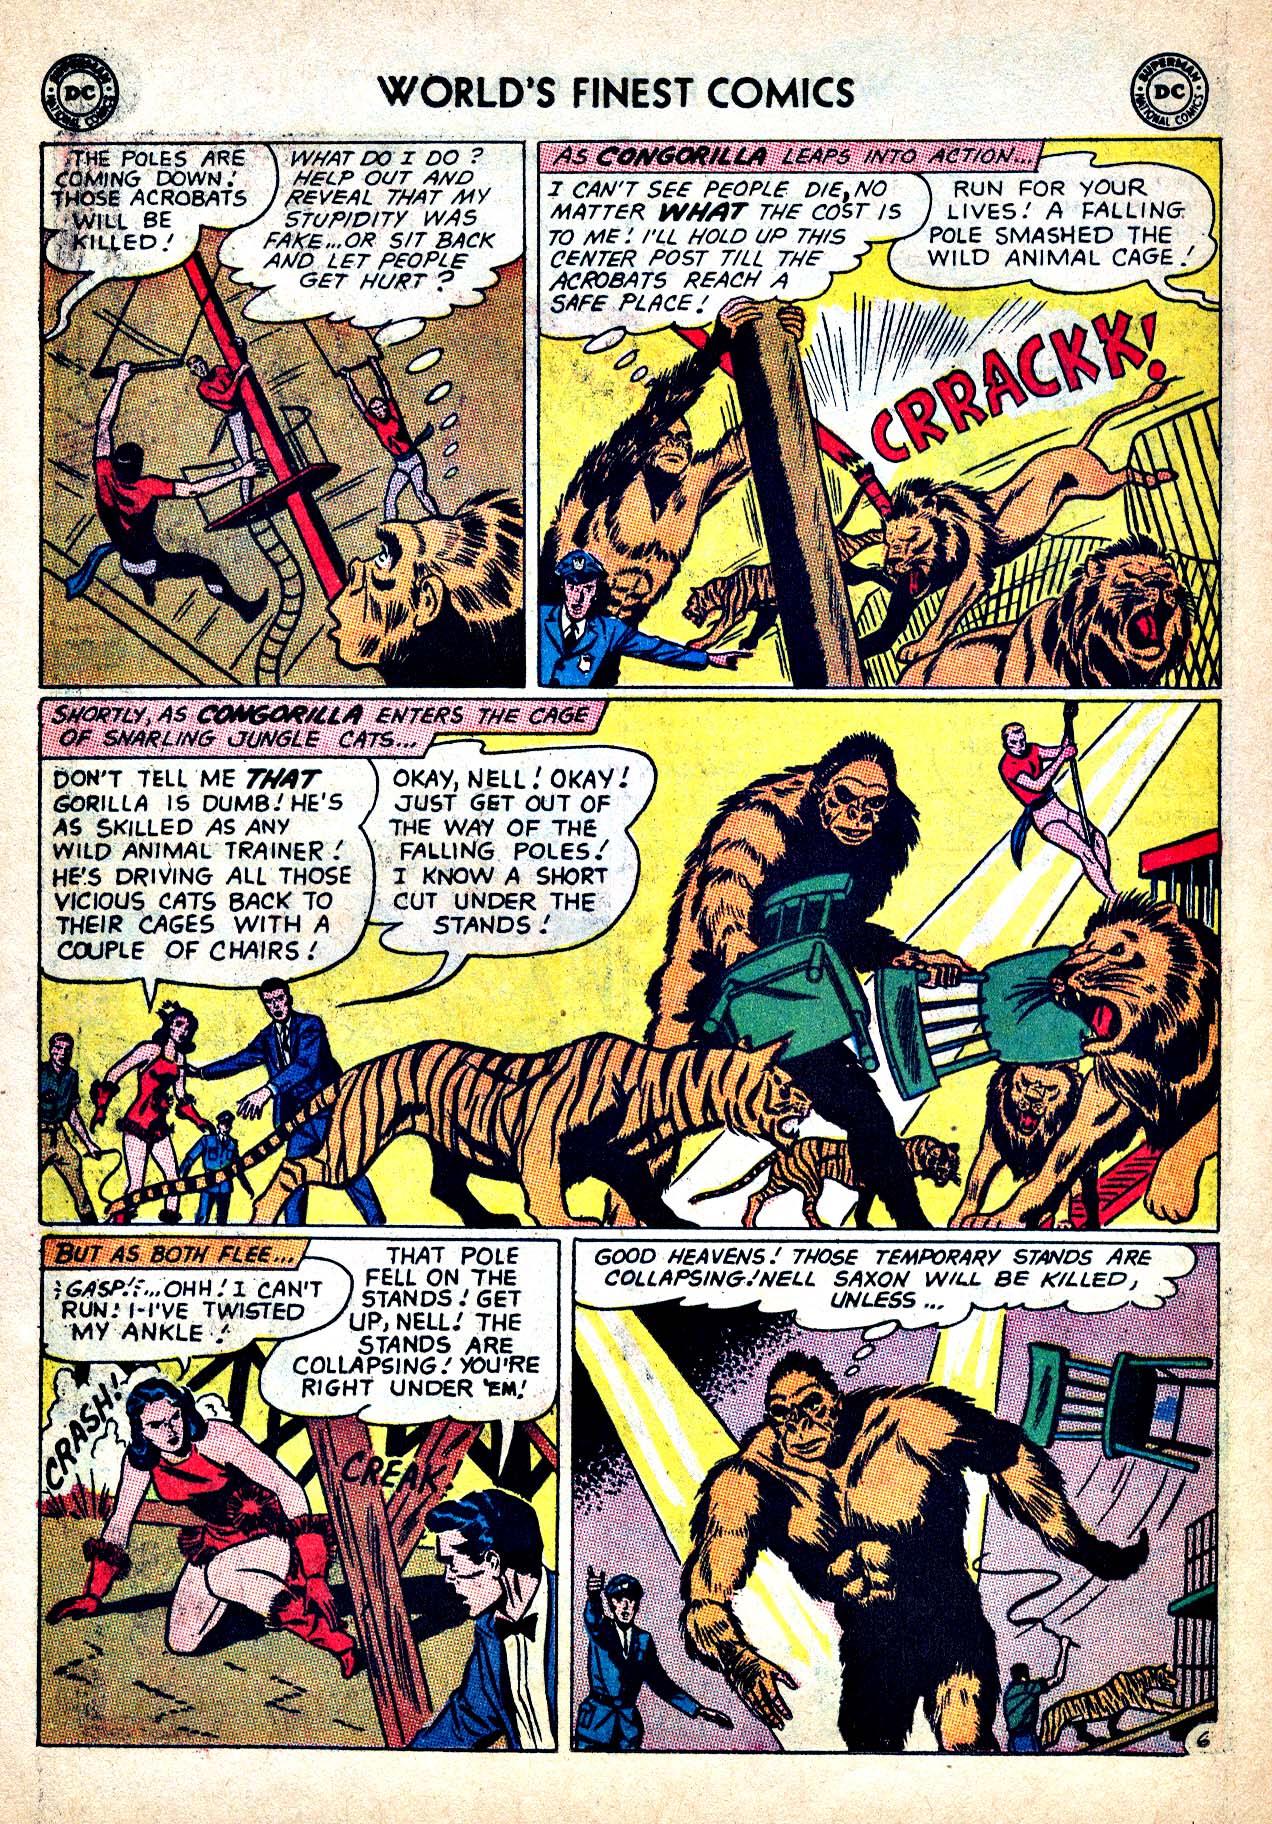 Read online World's Finest Comics comic -  Issue #150 - 30